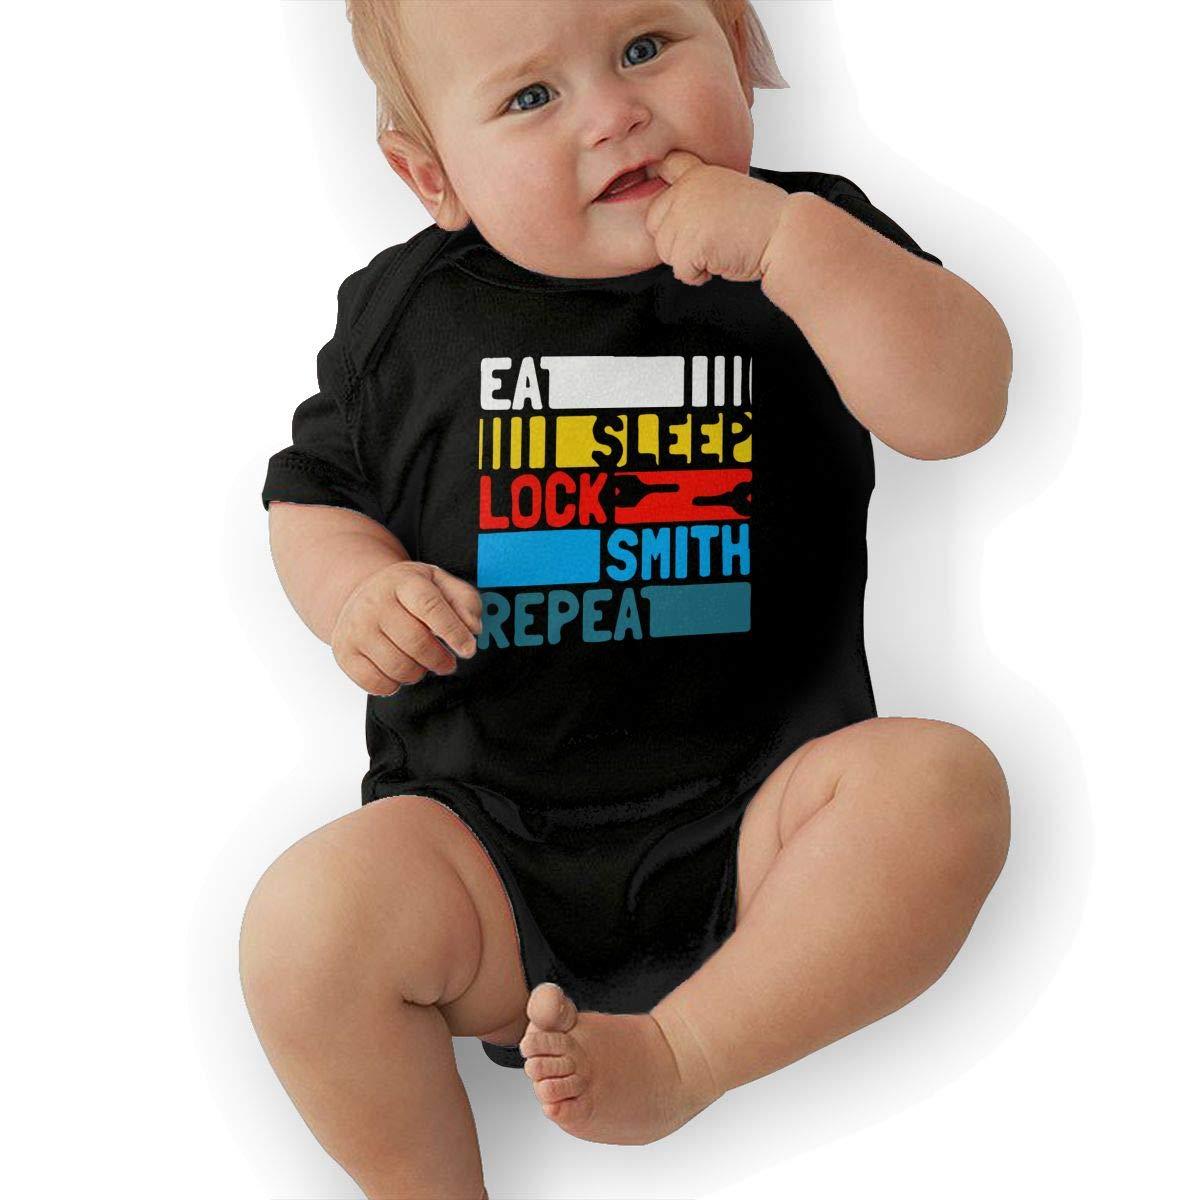 U88oi-8 Short Sleeve Cotton Rompers for Baby Girls Boys Cute Eat Sleep Locksmith Repeat Onesies